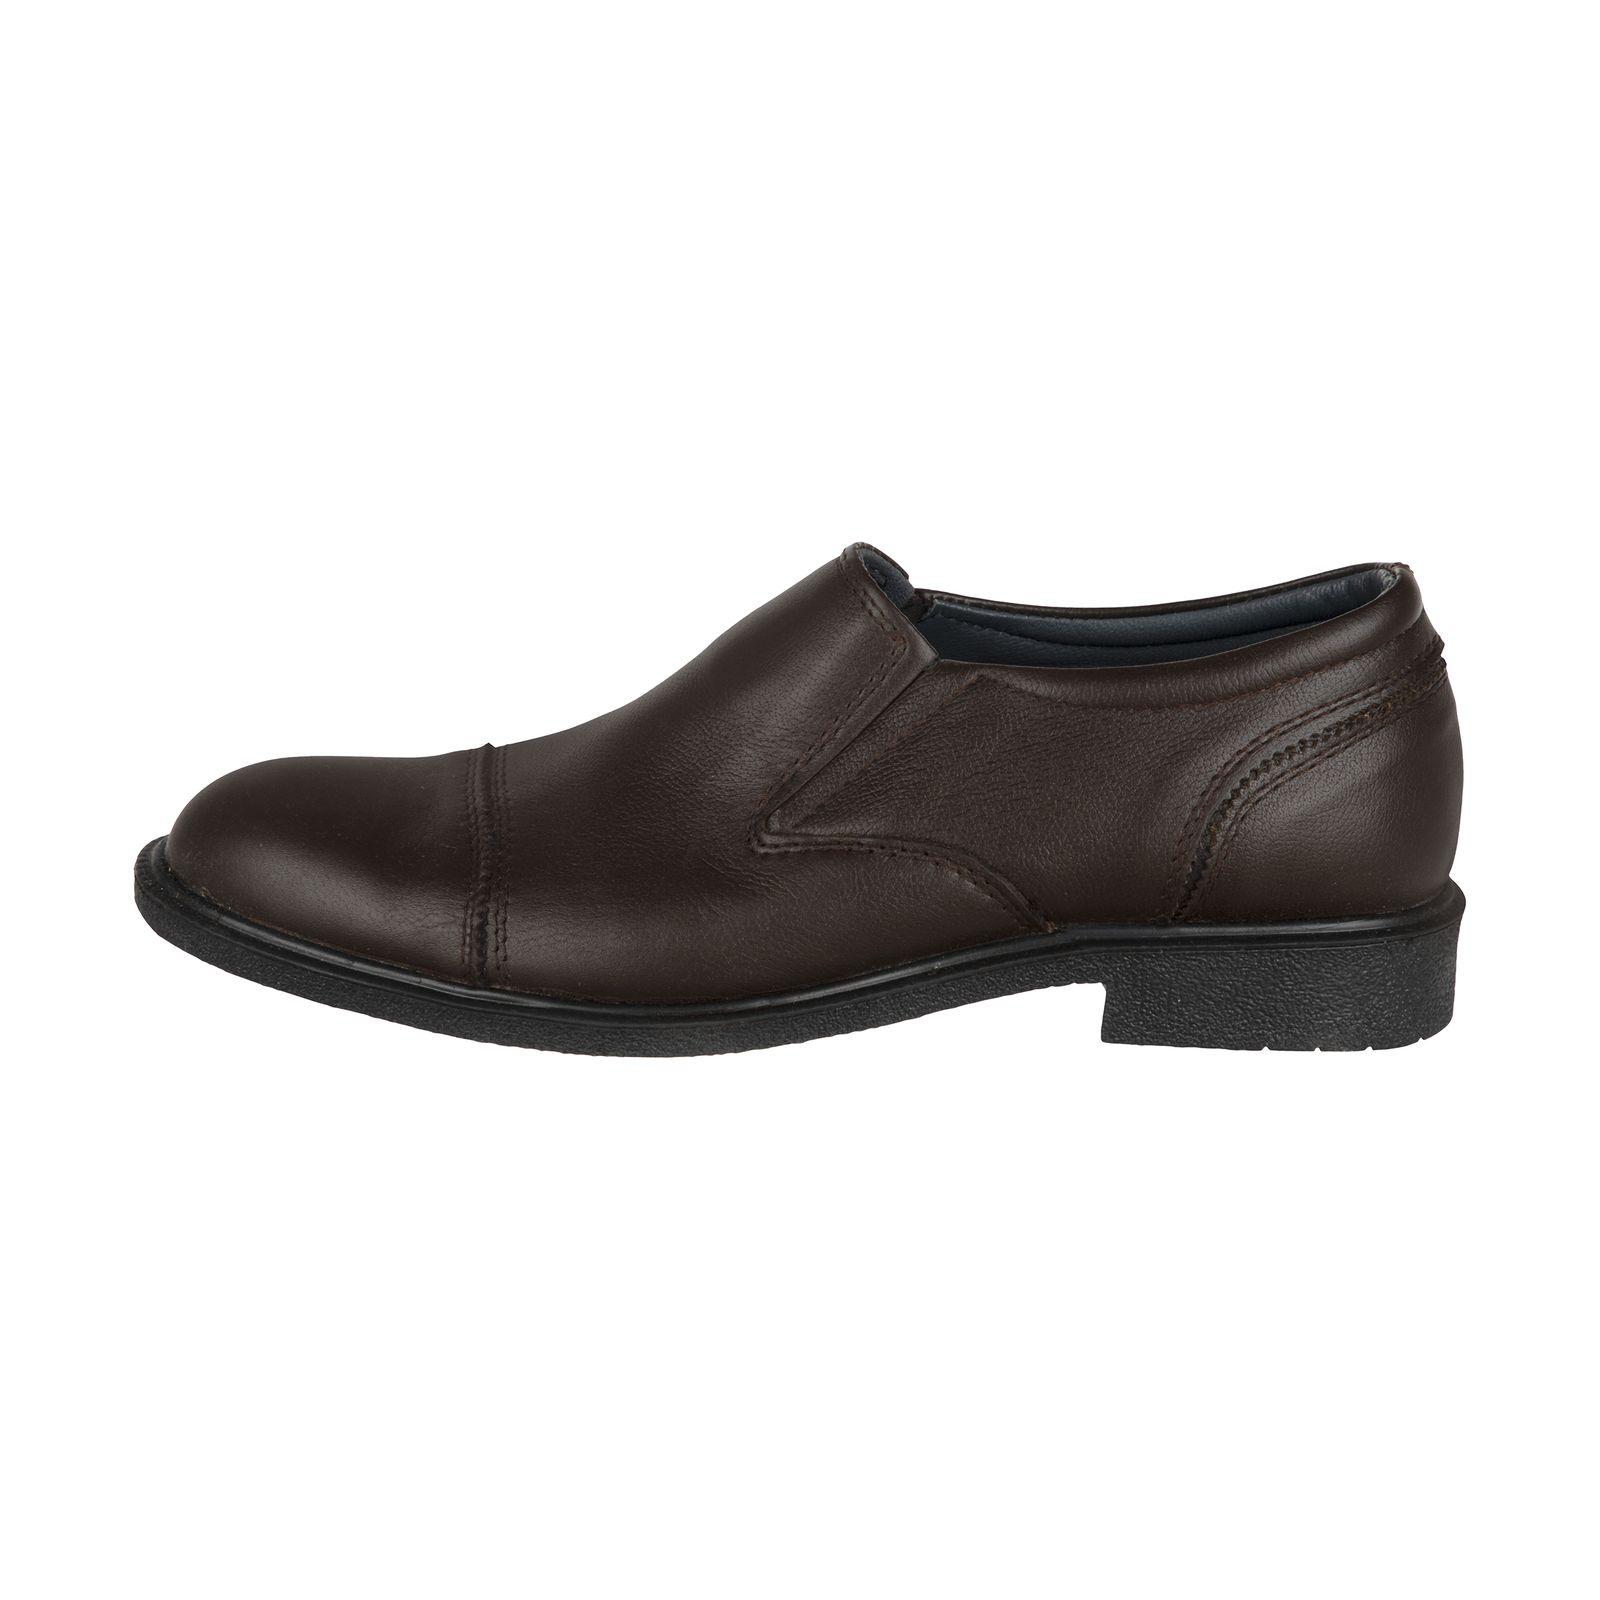 کفش مردانه سوته مدل 4870E503104 -  - 2